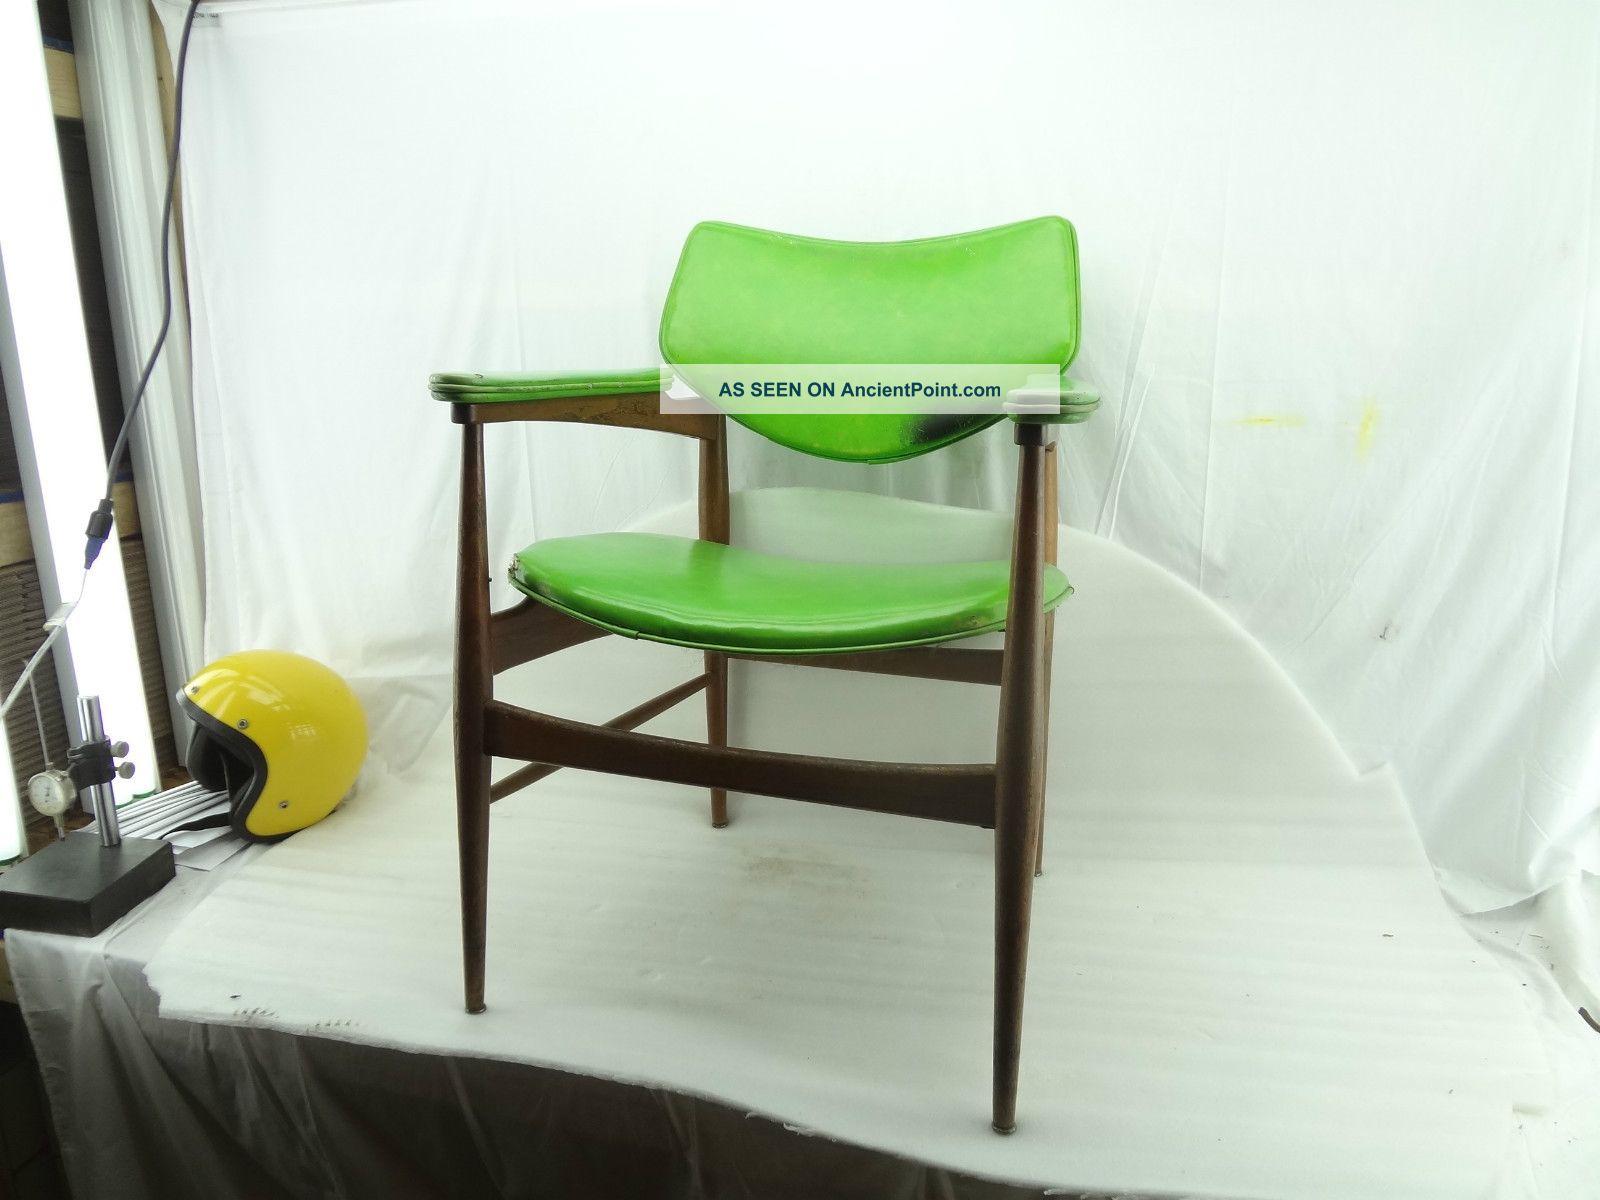 Vintage Retro Mid Century Chair 50s Furniture Modern Danish Style Stool Green Post-1950 photo